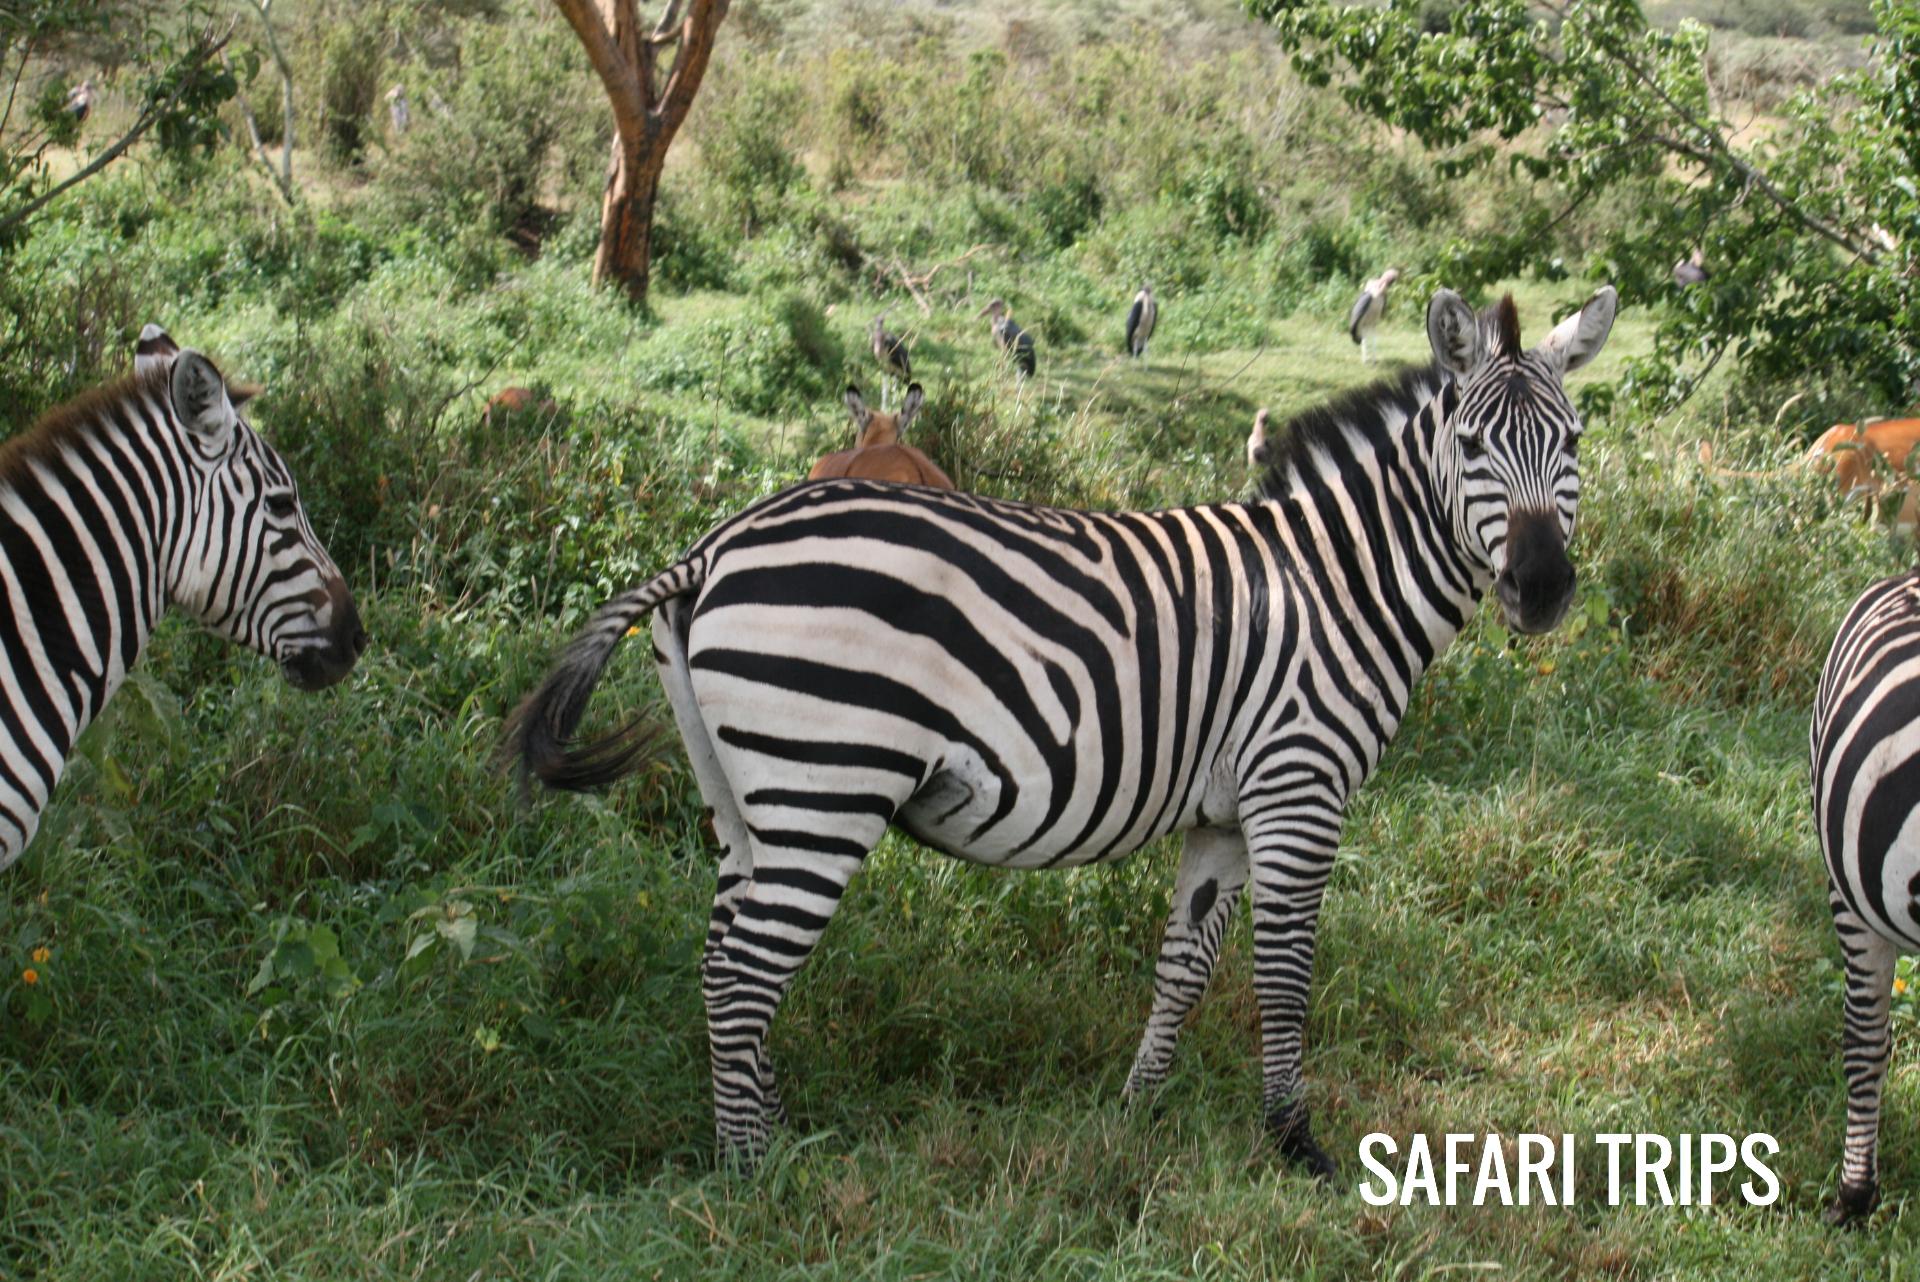 zebra-looking-at-camera_edited.JPG